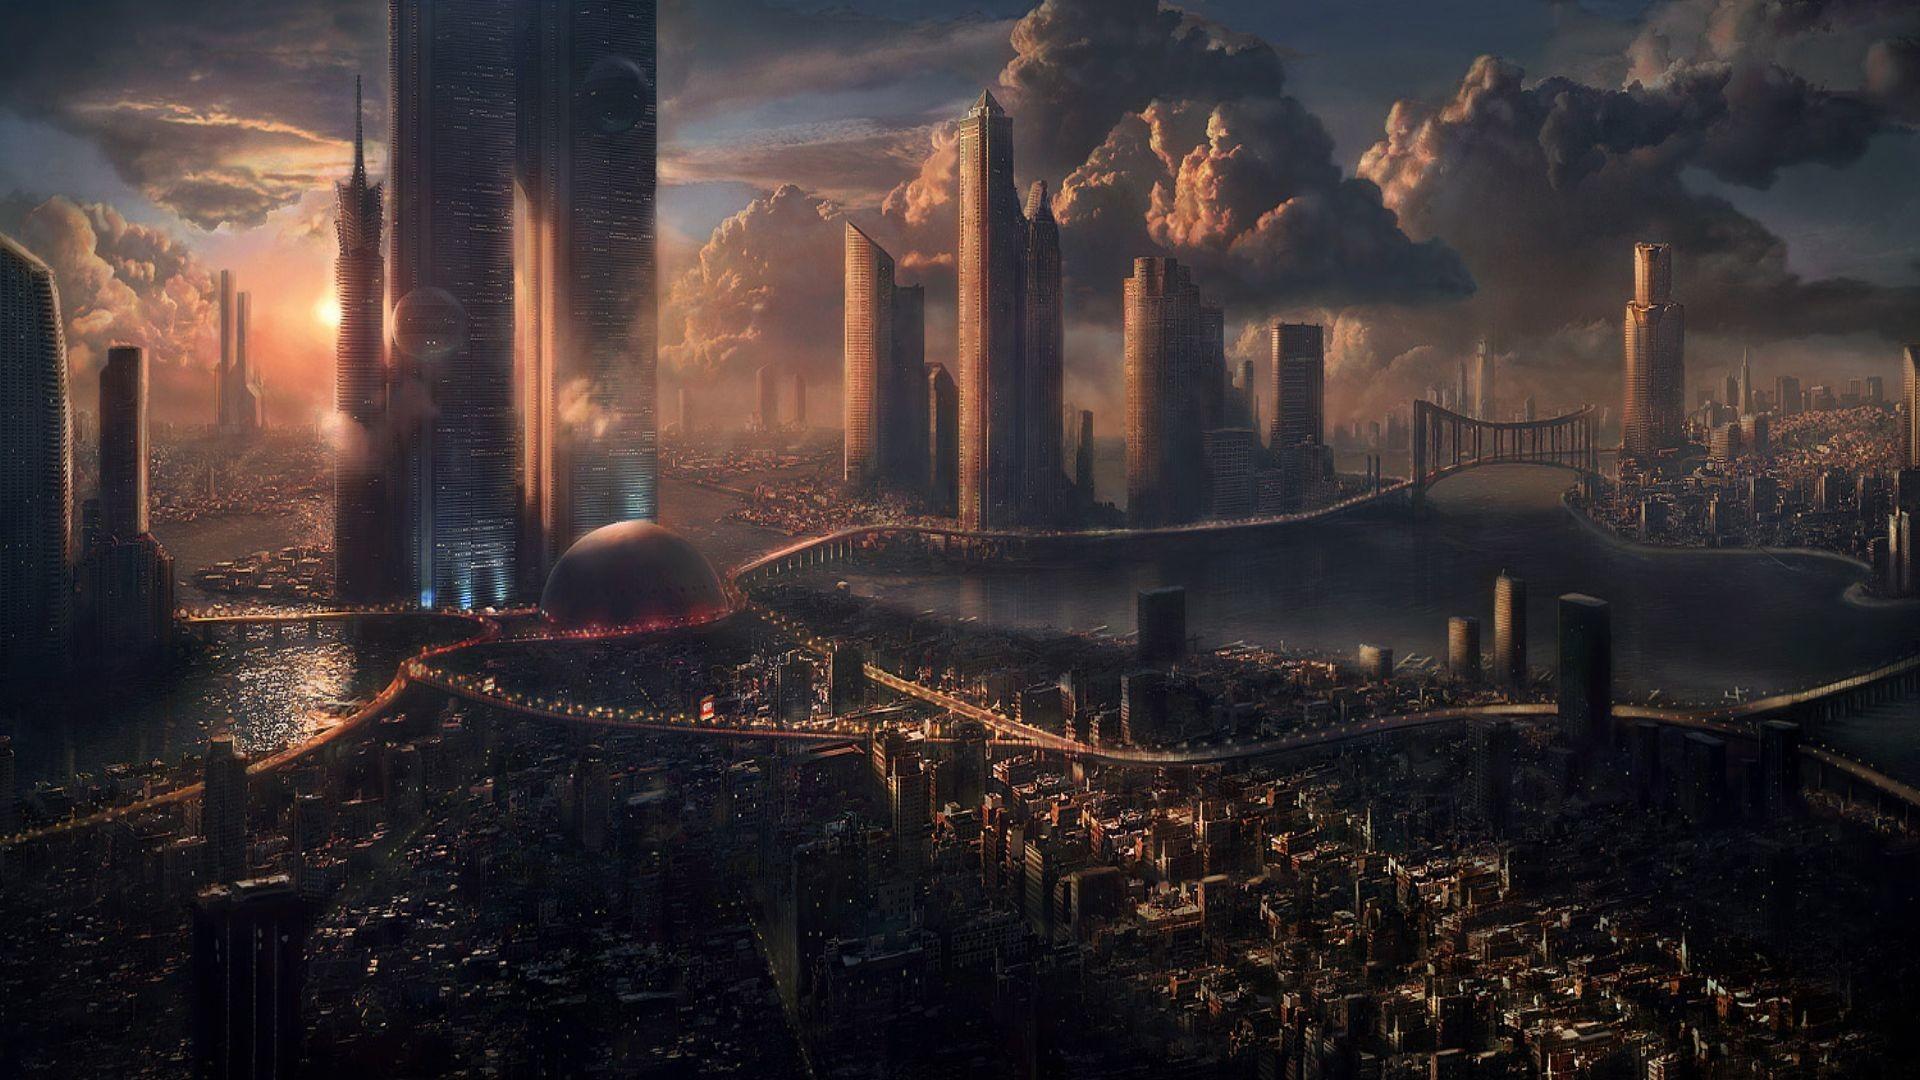 Explore City Wallpaper, Sci Fi Wallpaper, and more!